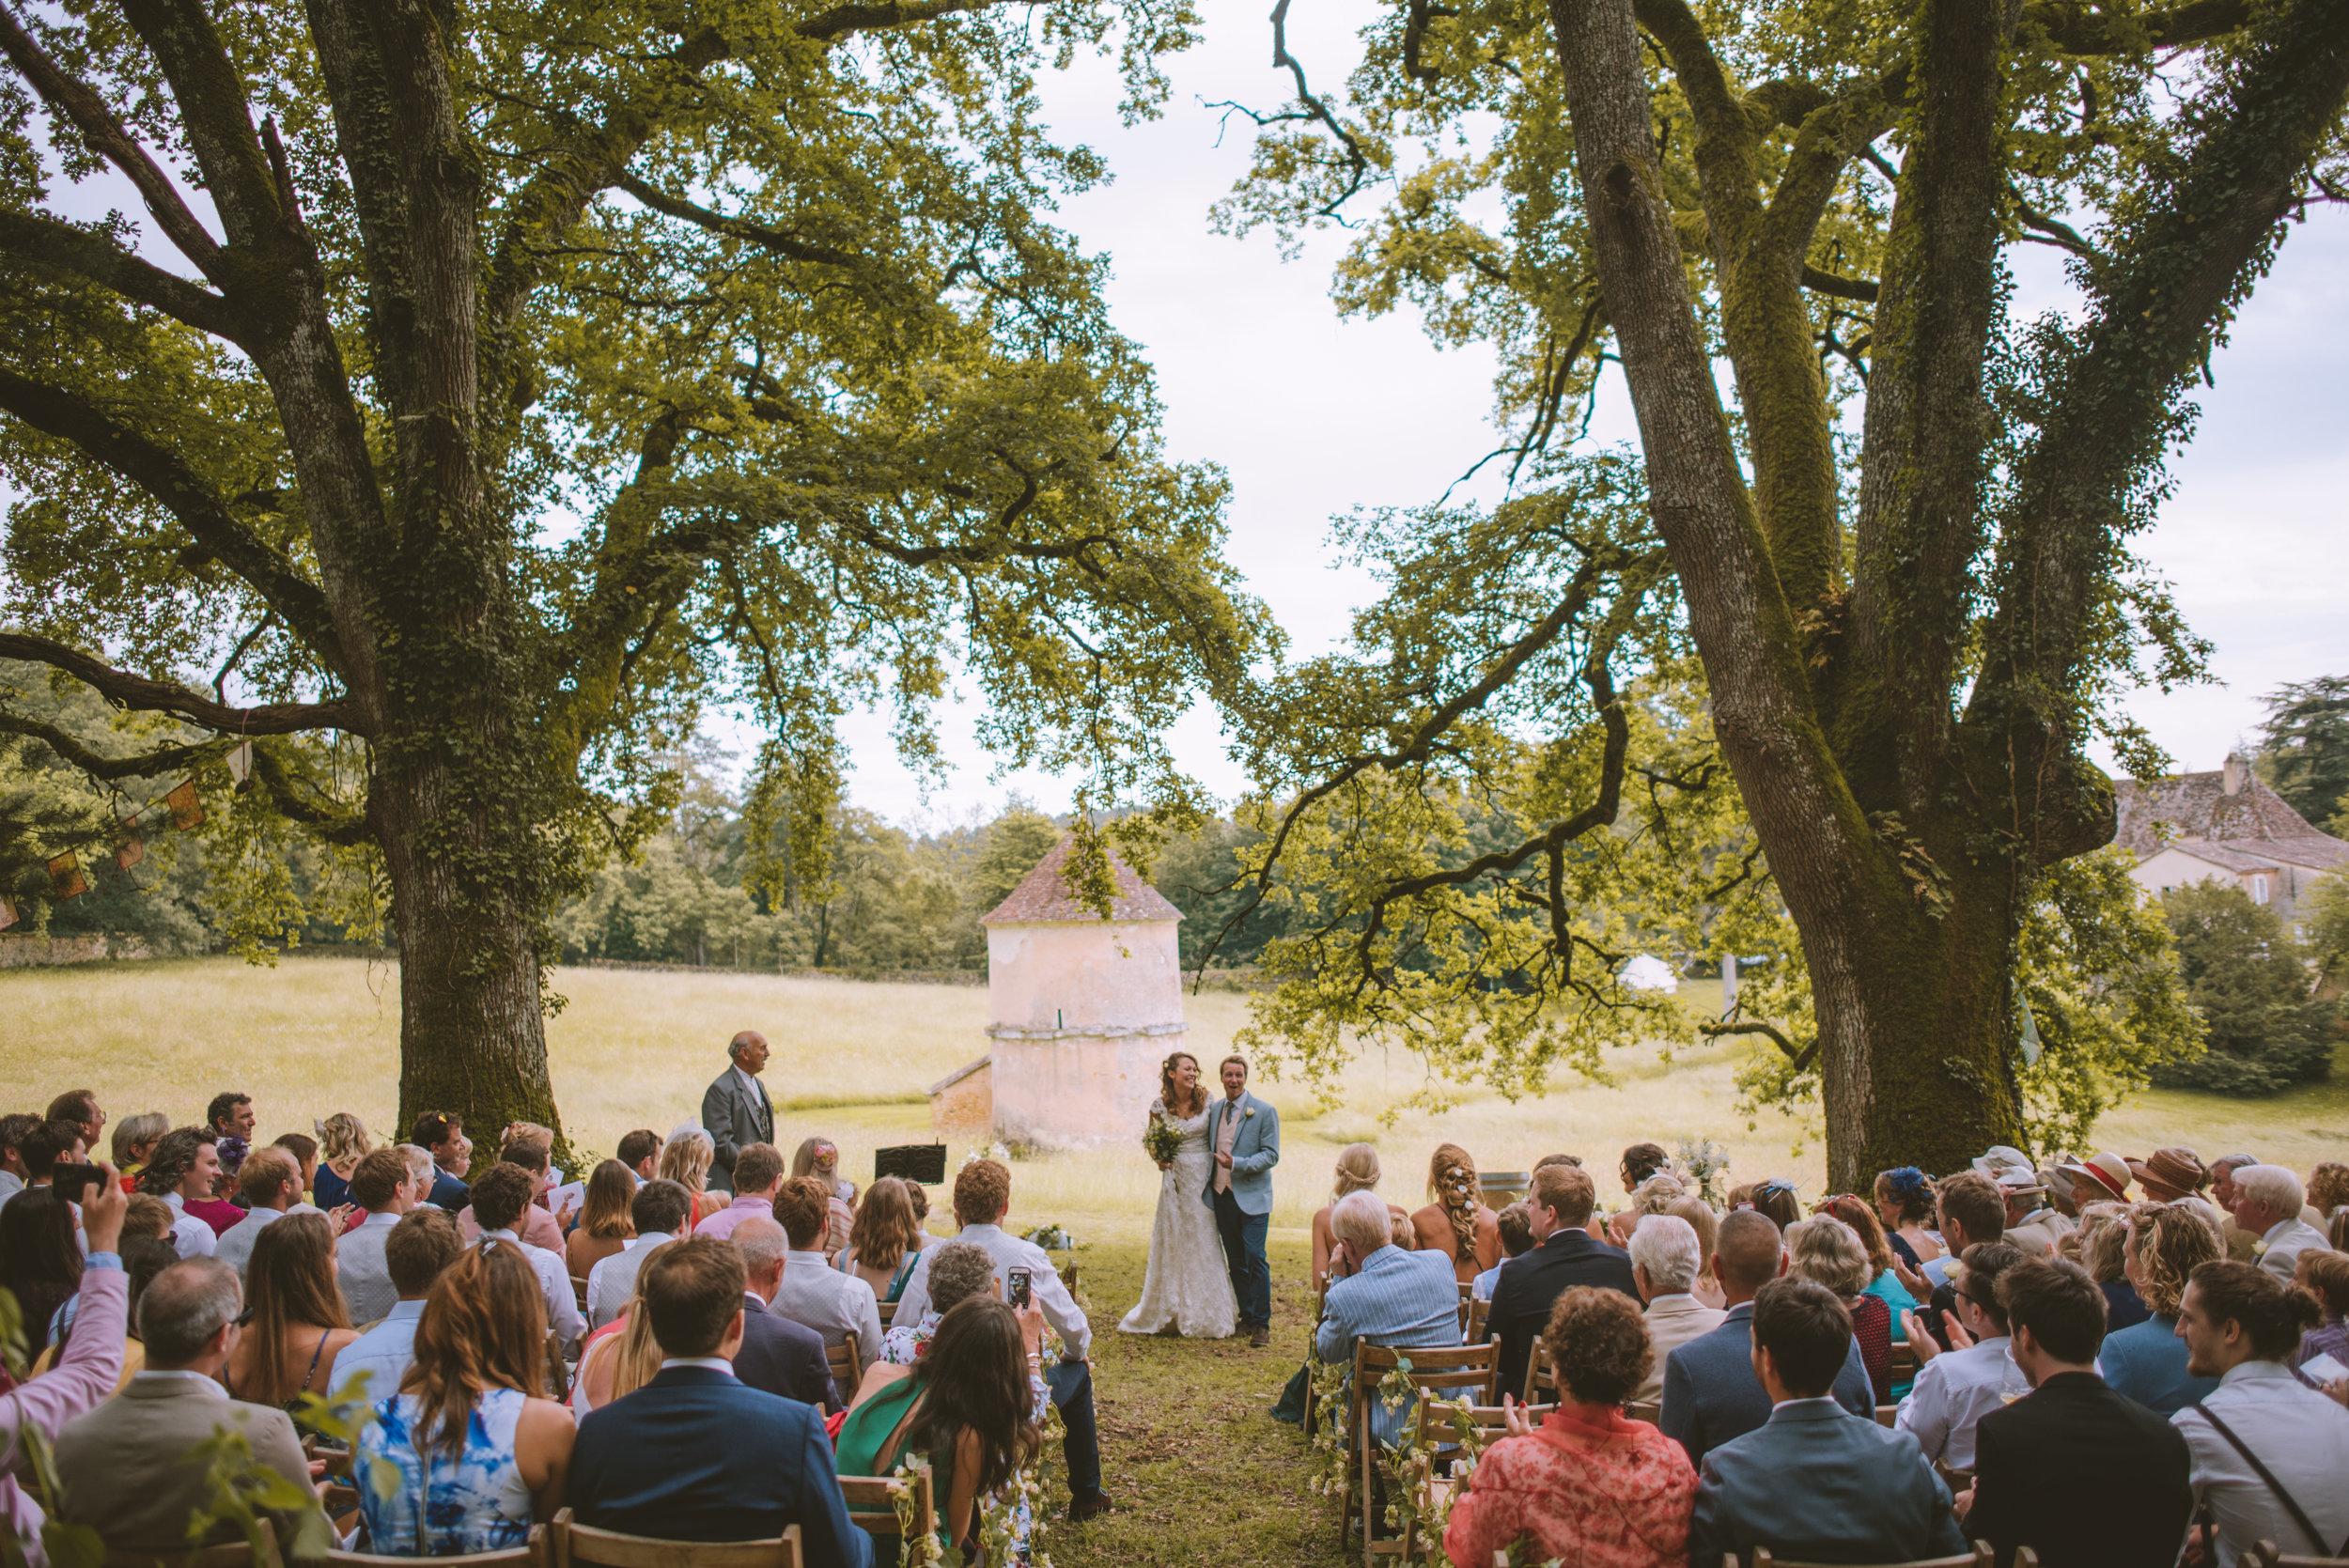 dordogne-wedding-photographer-mark-shaw-21.jpg